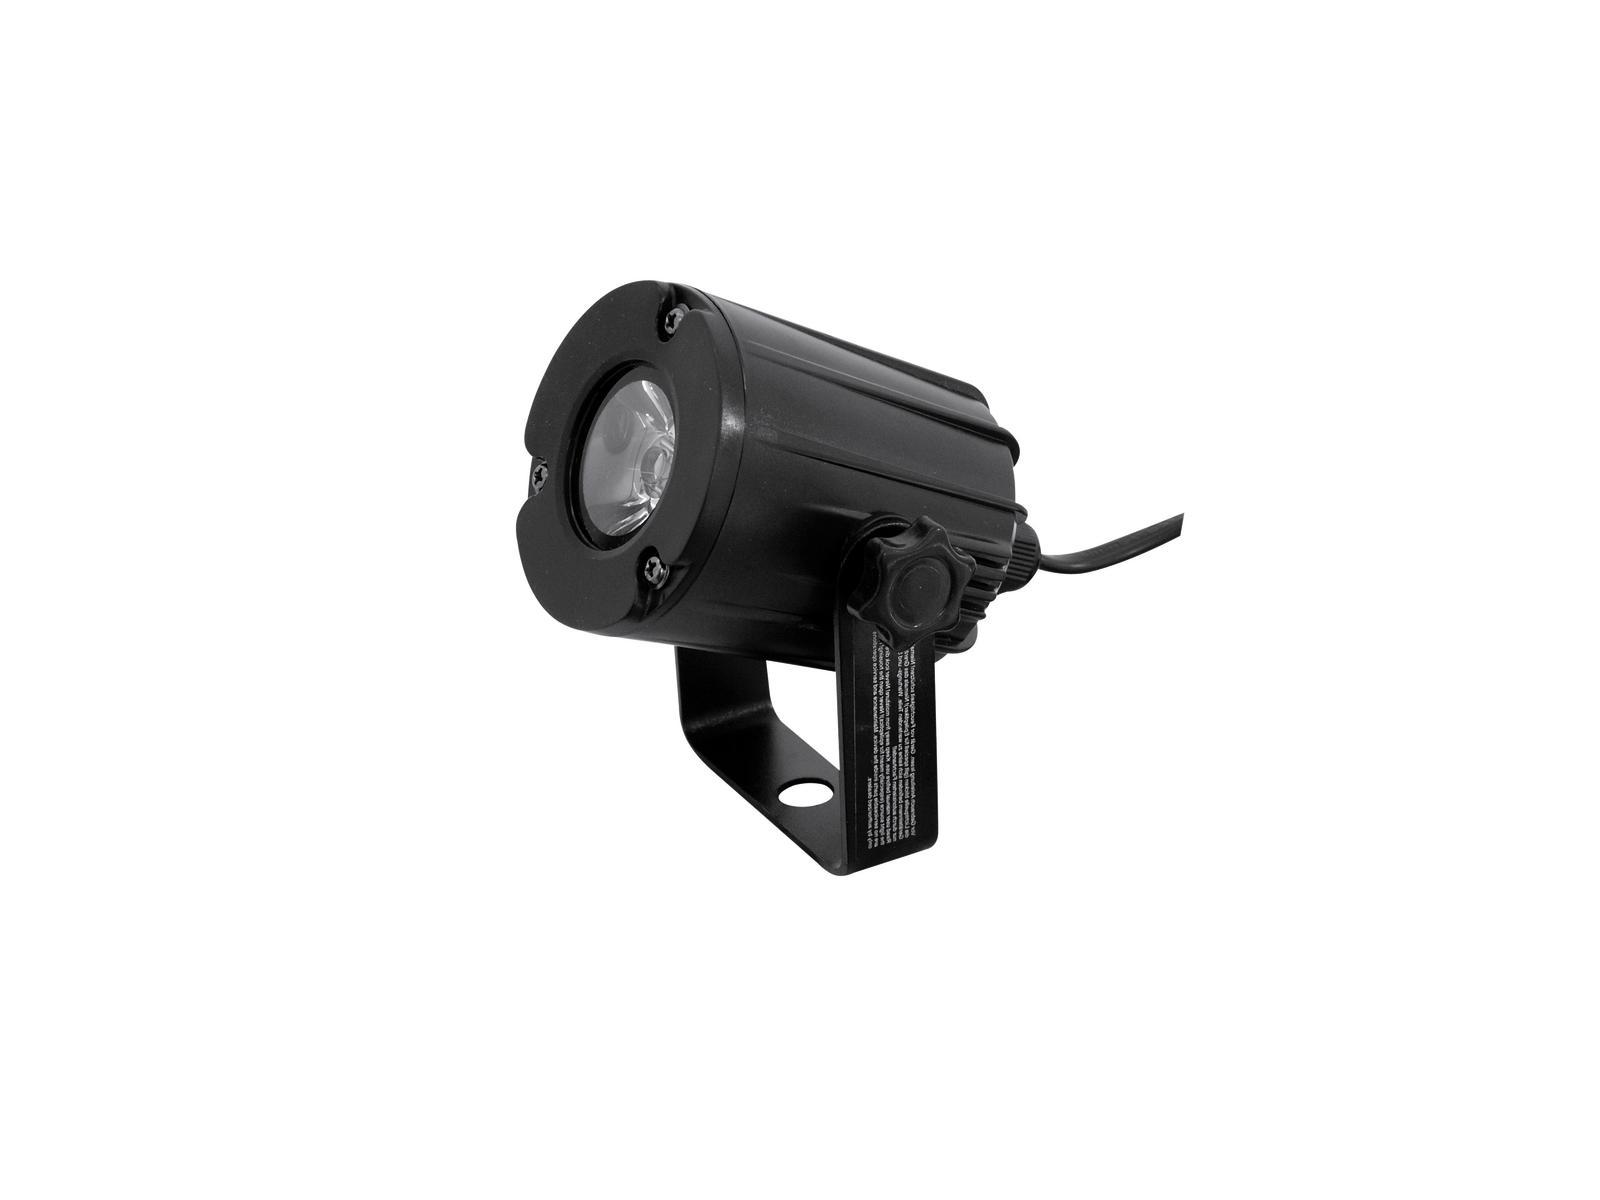 Eurolite LED spot 3W, 3200K, 6°, černý